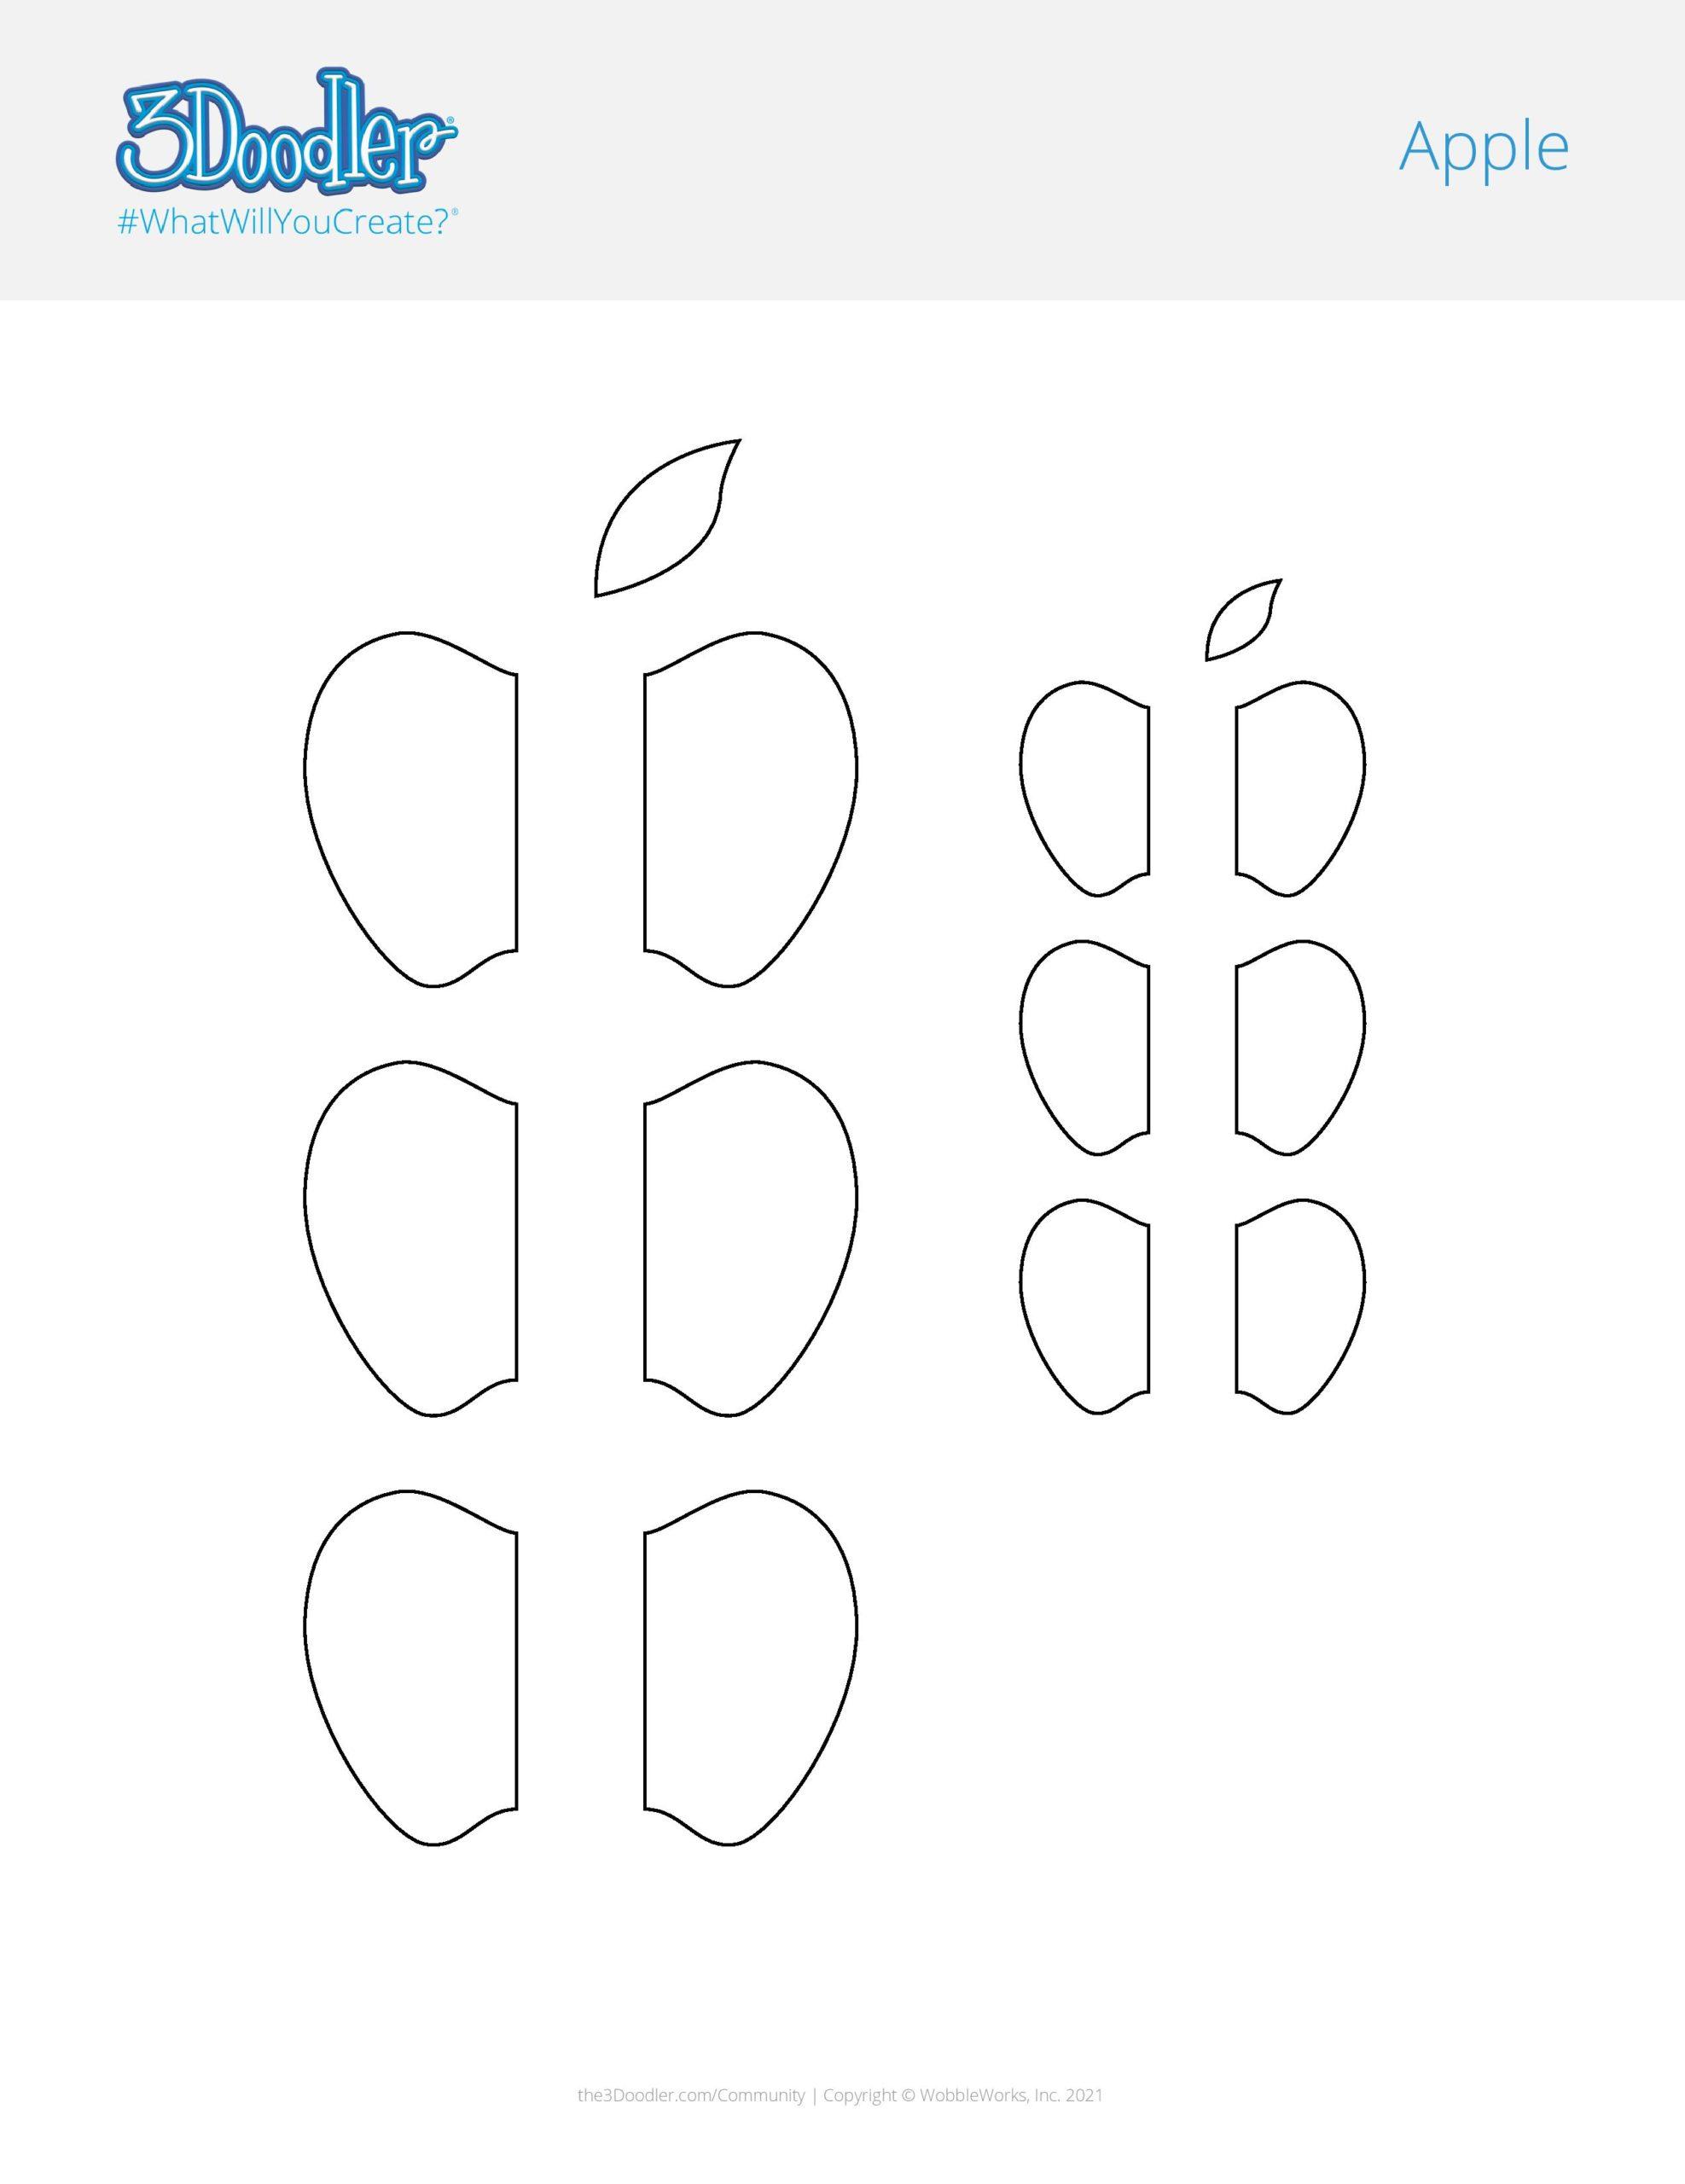 3D Pen Stencil Template Apple Stencil